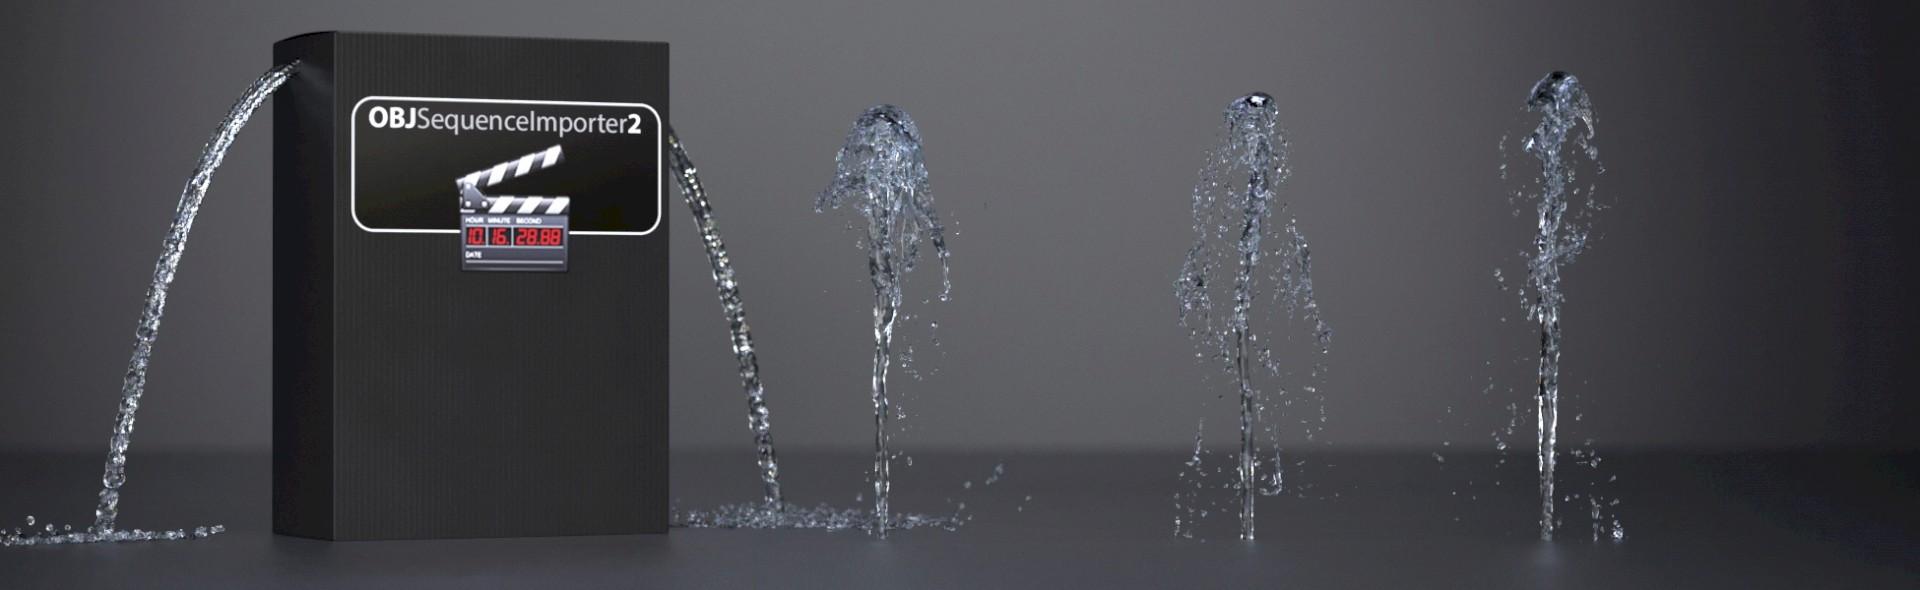 Obj Sequence Importer 2 1 - Plug-ins - Shop - C4Dzone